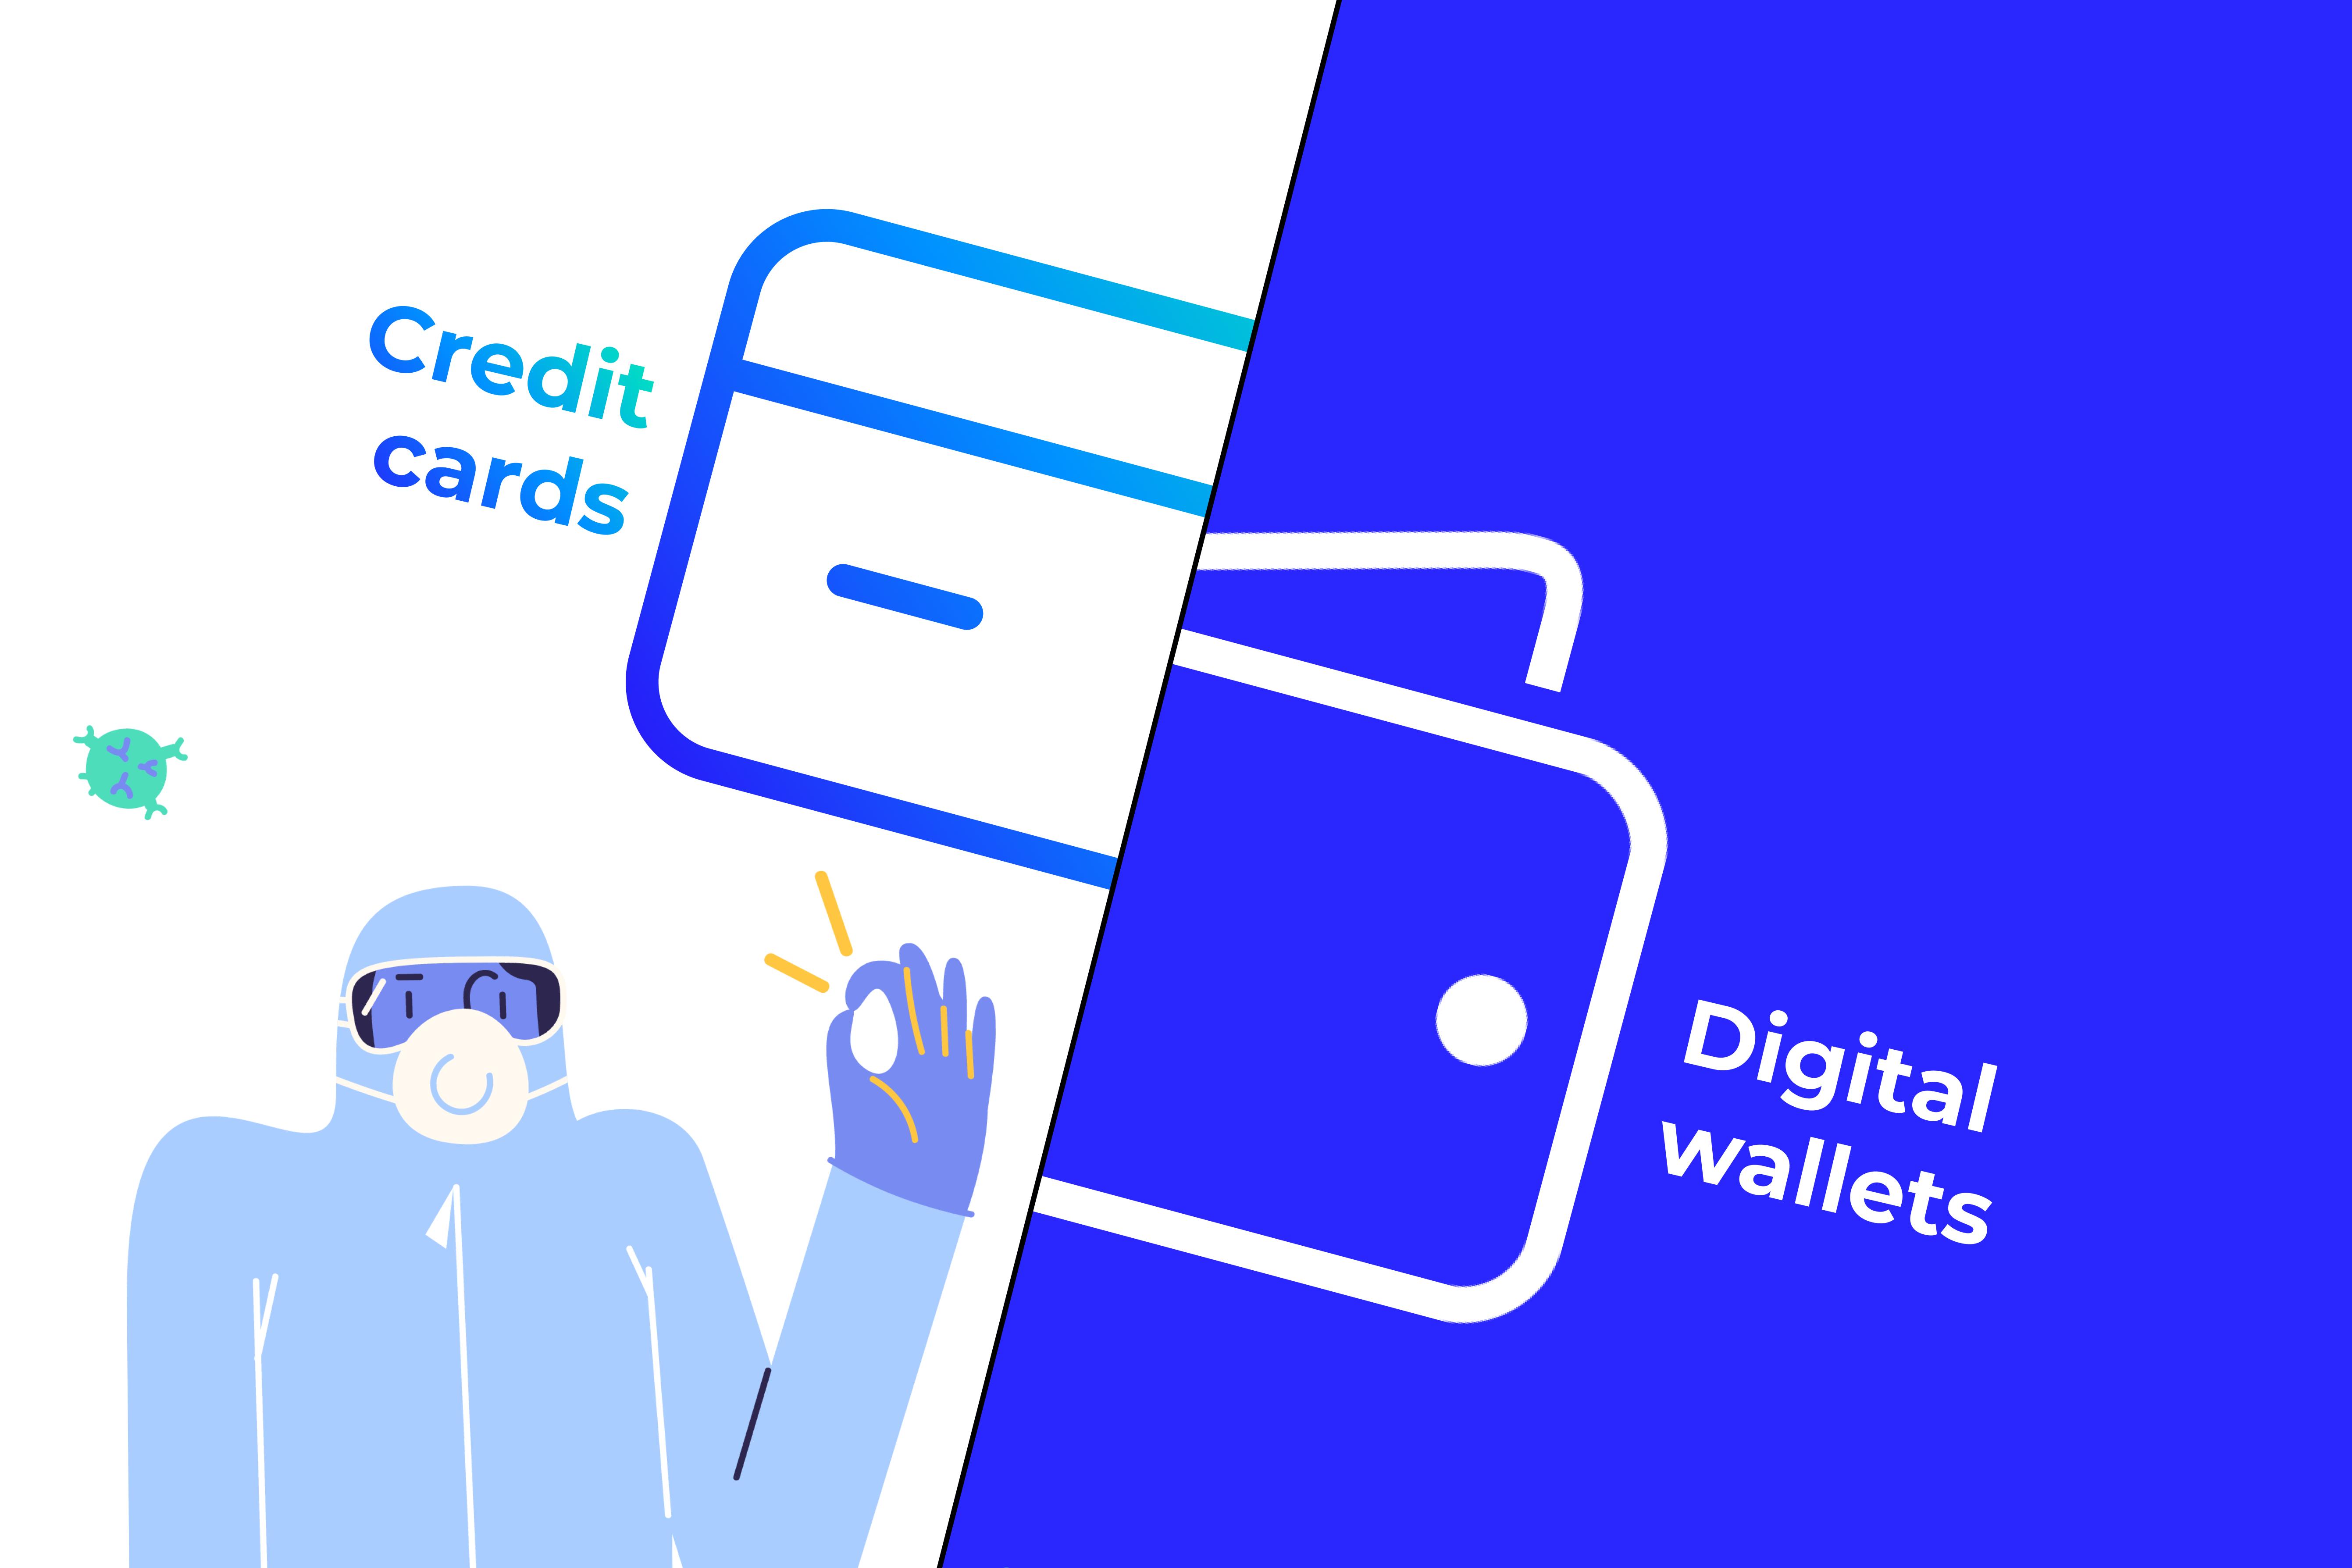 Digital wallets vs. credit cards - Best digital wallets you should explore